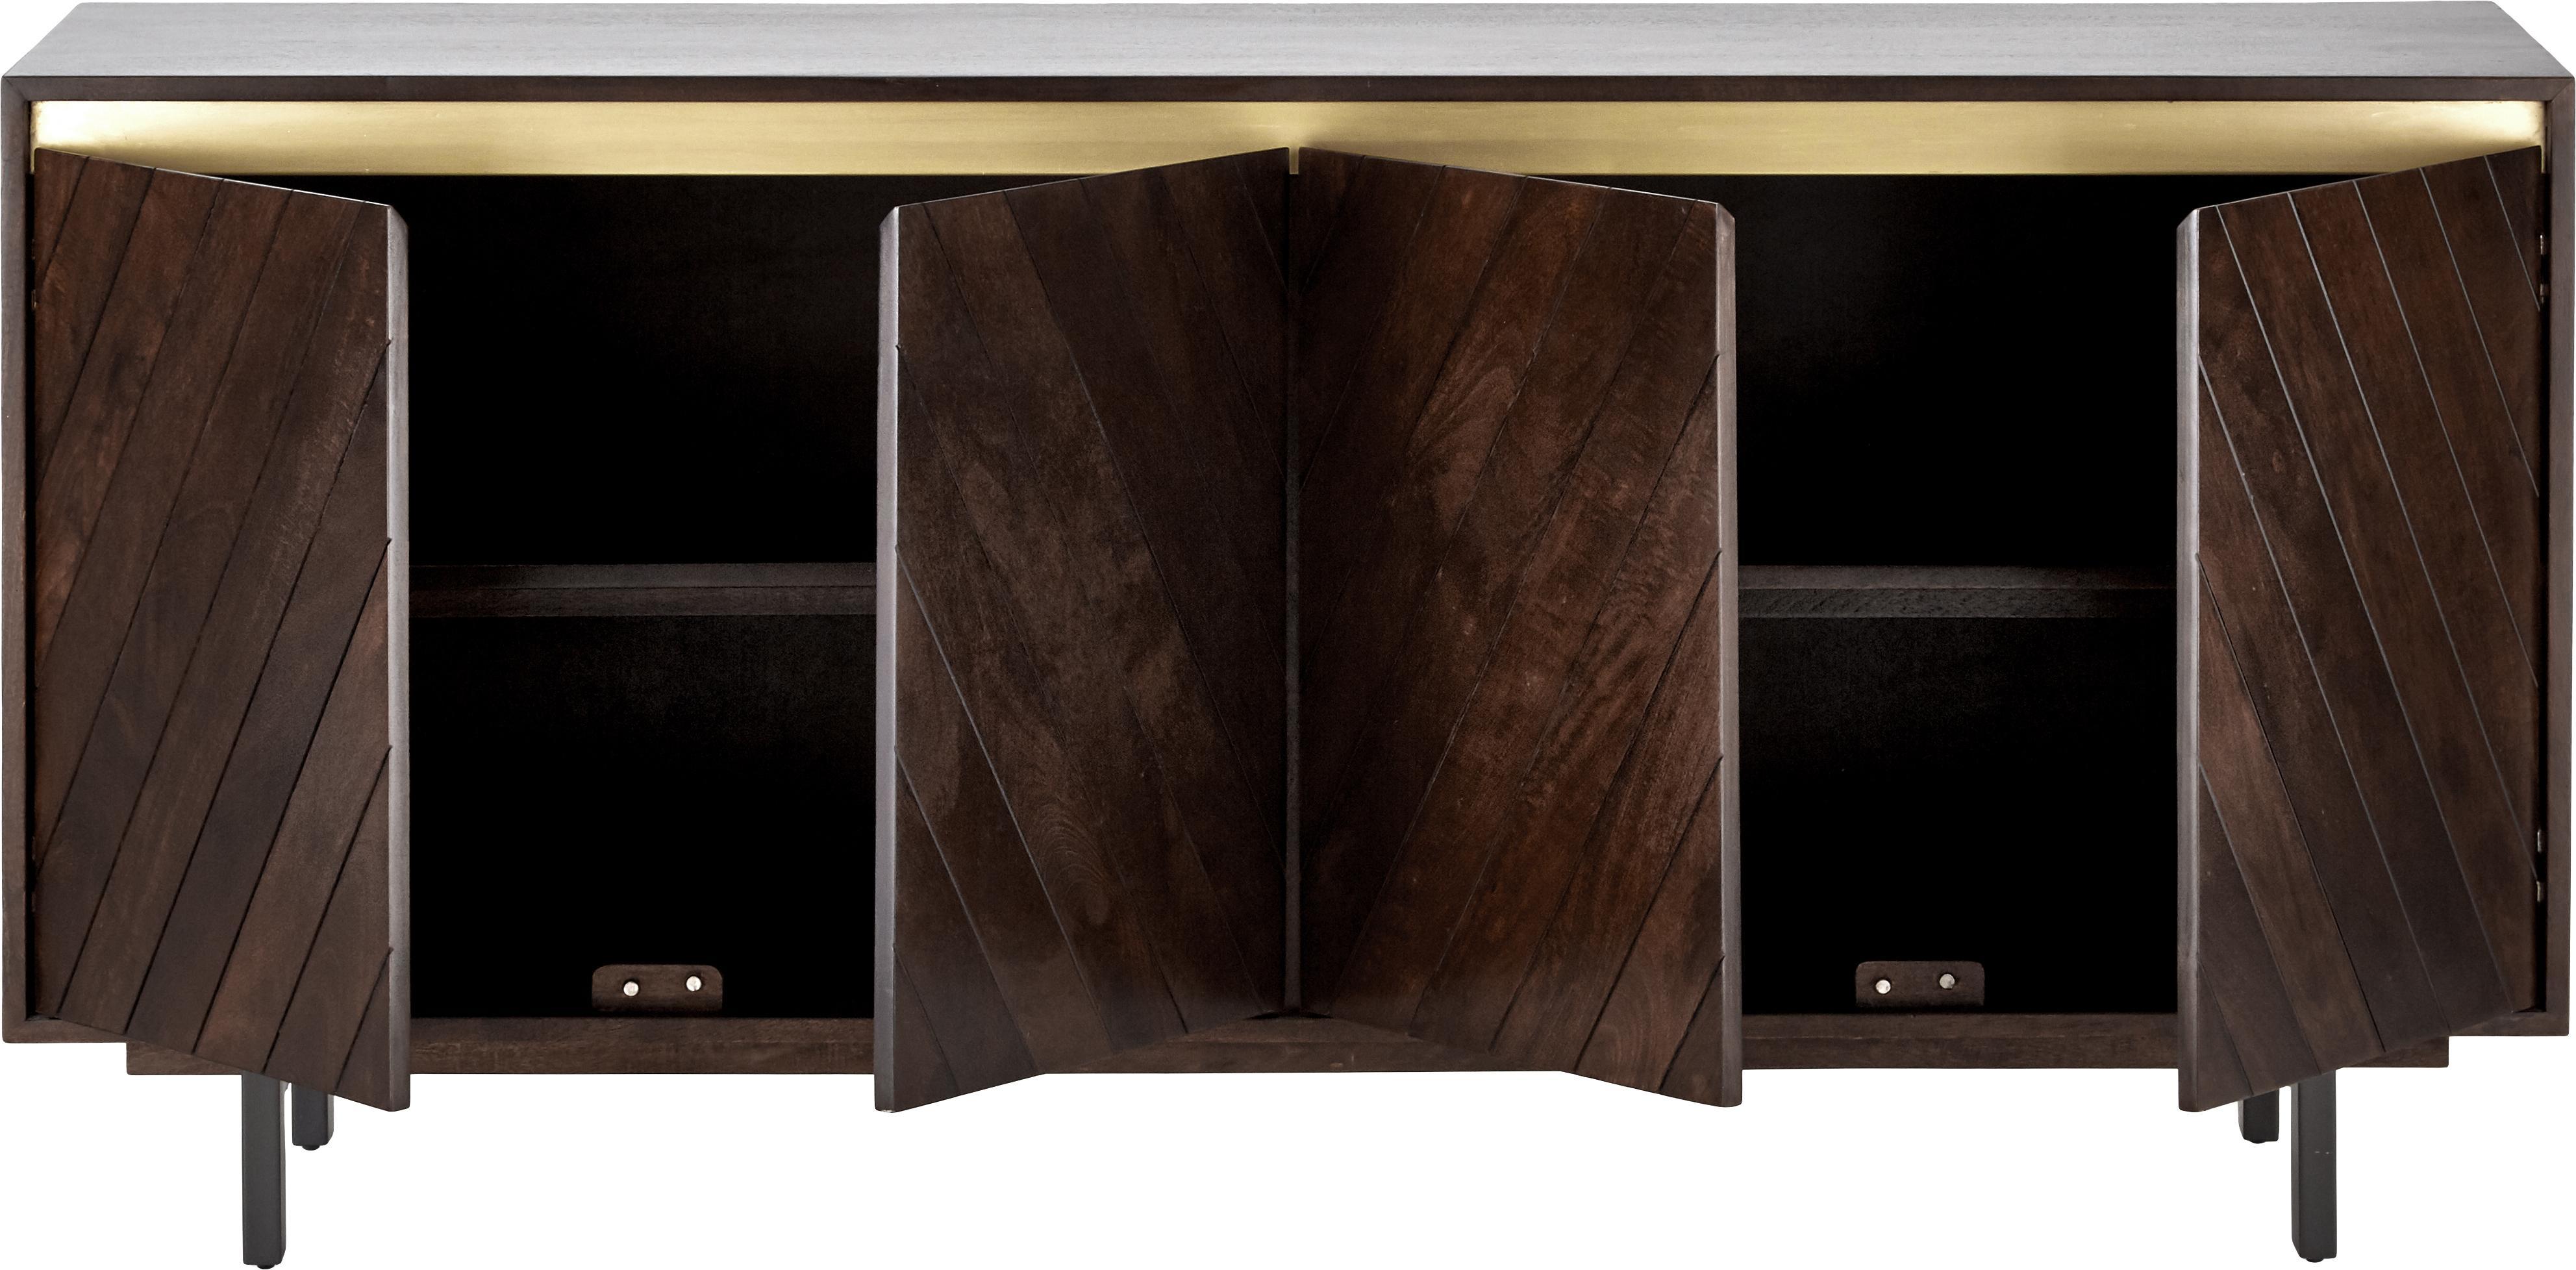 Massivholz Sideboard Karl, Korpus: Massives Mangoholz, lacki, Füße: Metall, pulverbeschichtet, Mangoholz, Goldfarben, 165 x 61 cm